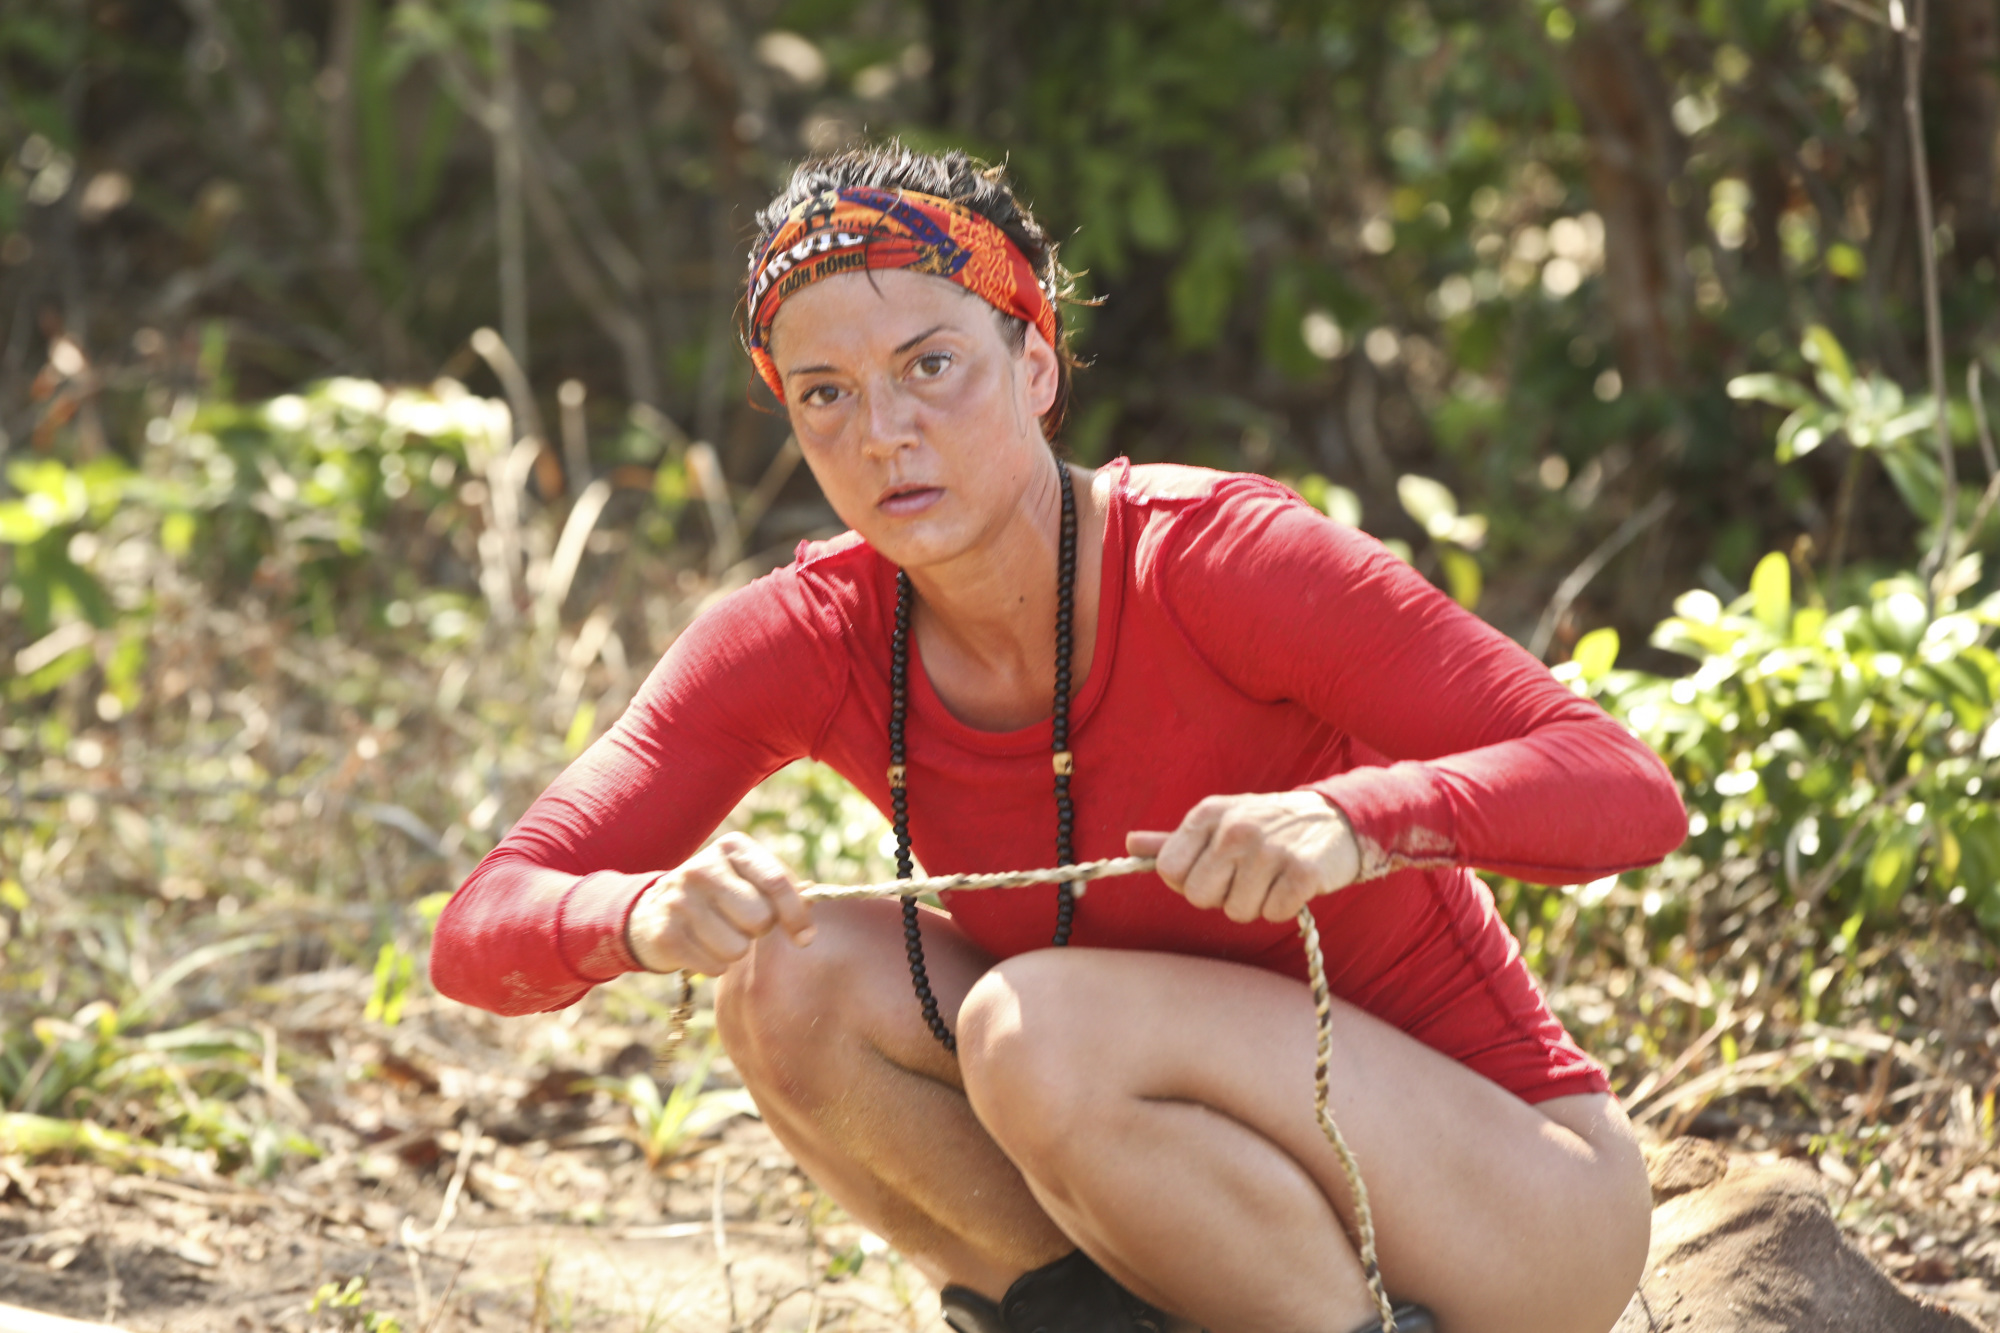 Jennifer Lanzetti works at Brawn tribe's camp on Survivor: Kaoh Rong